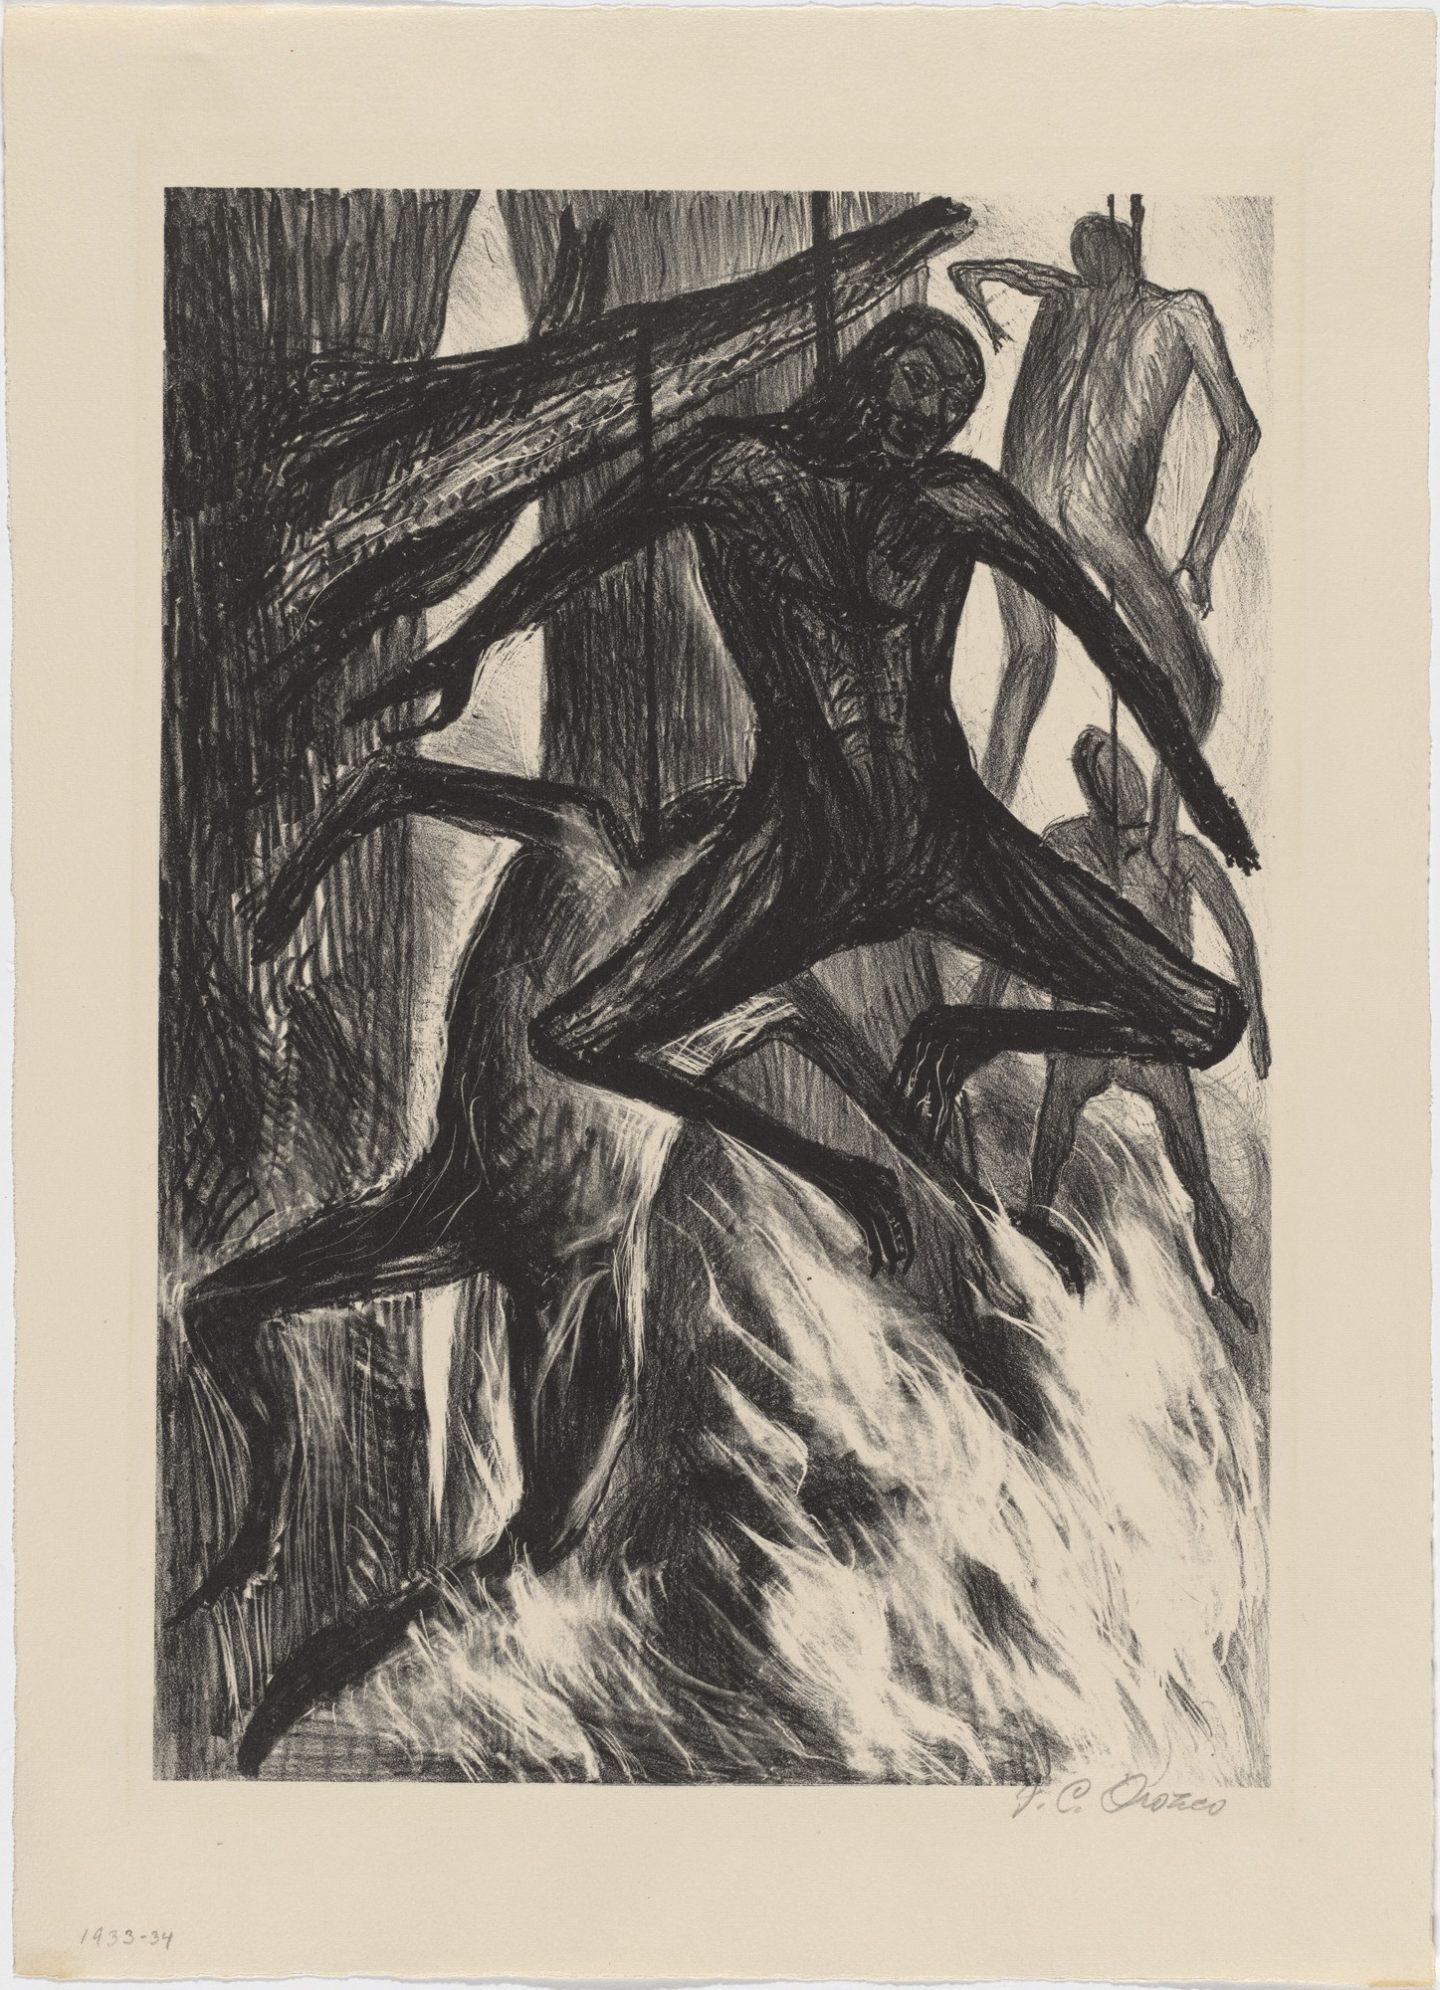 Jose Clemente Orozco, Powieszeni / Hanged 1935